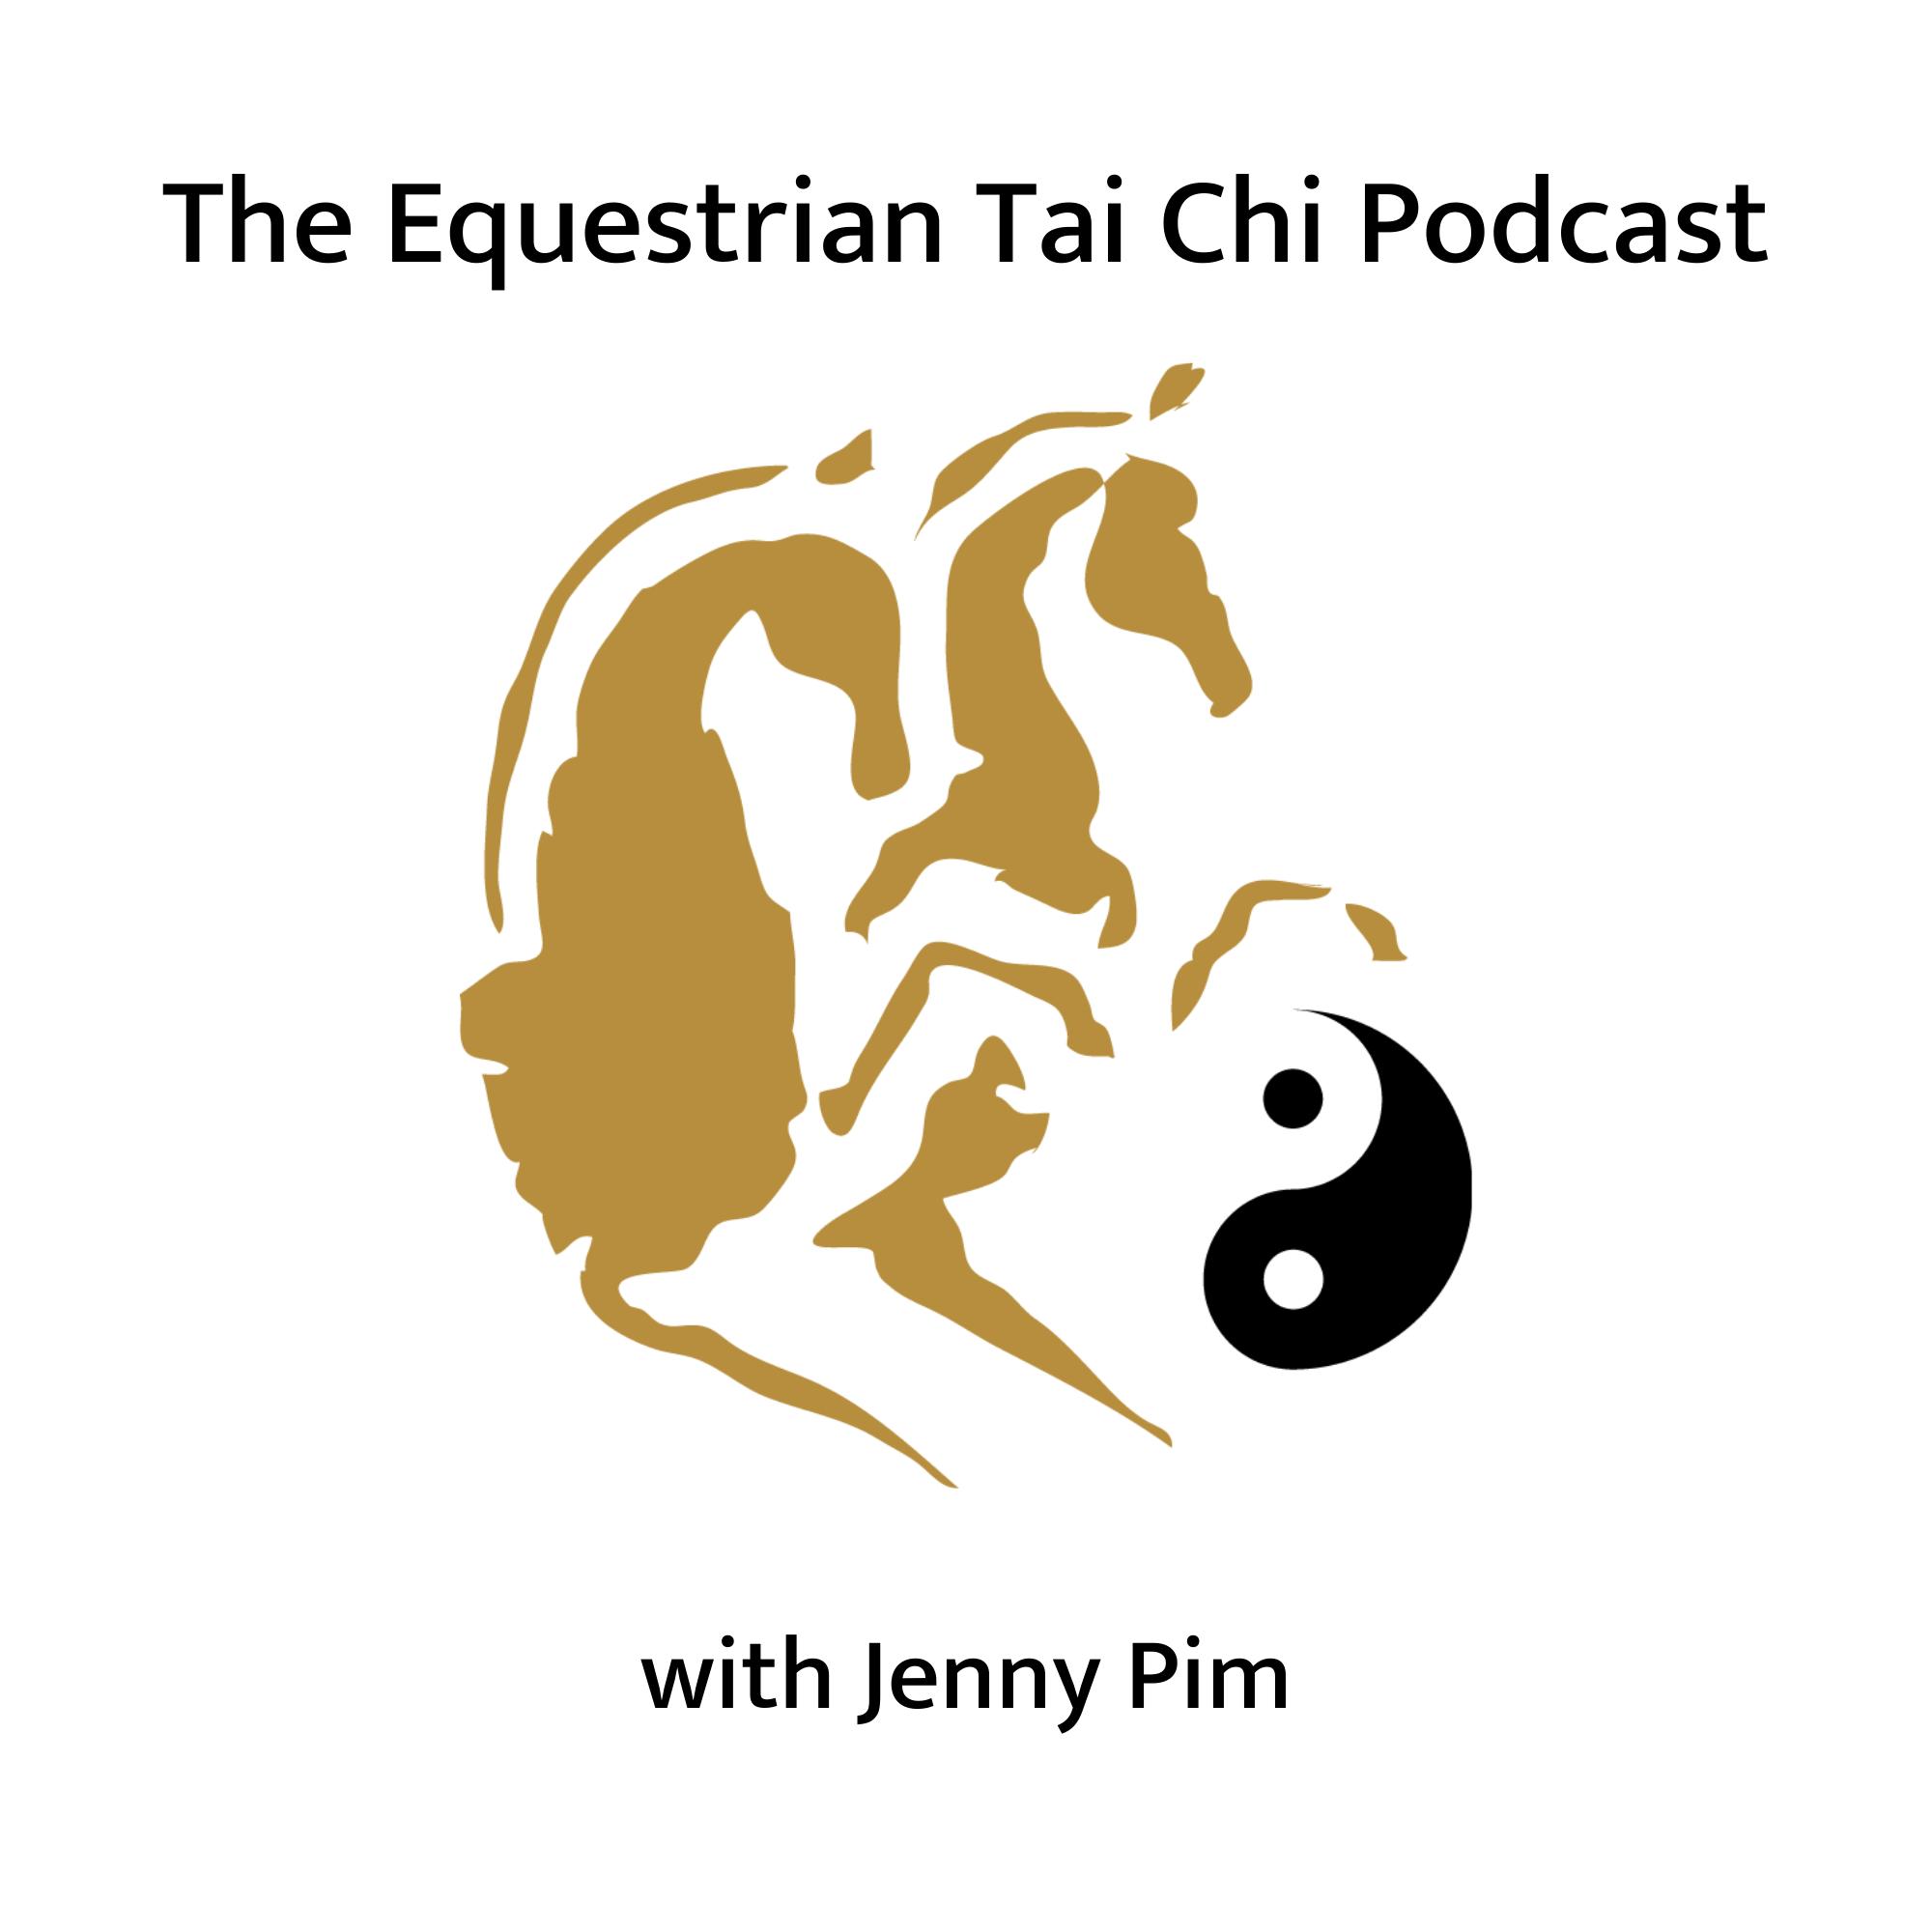 The Equestrian Tai Chi Podcast show art